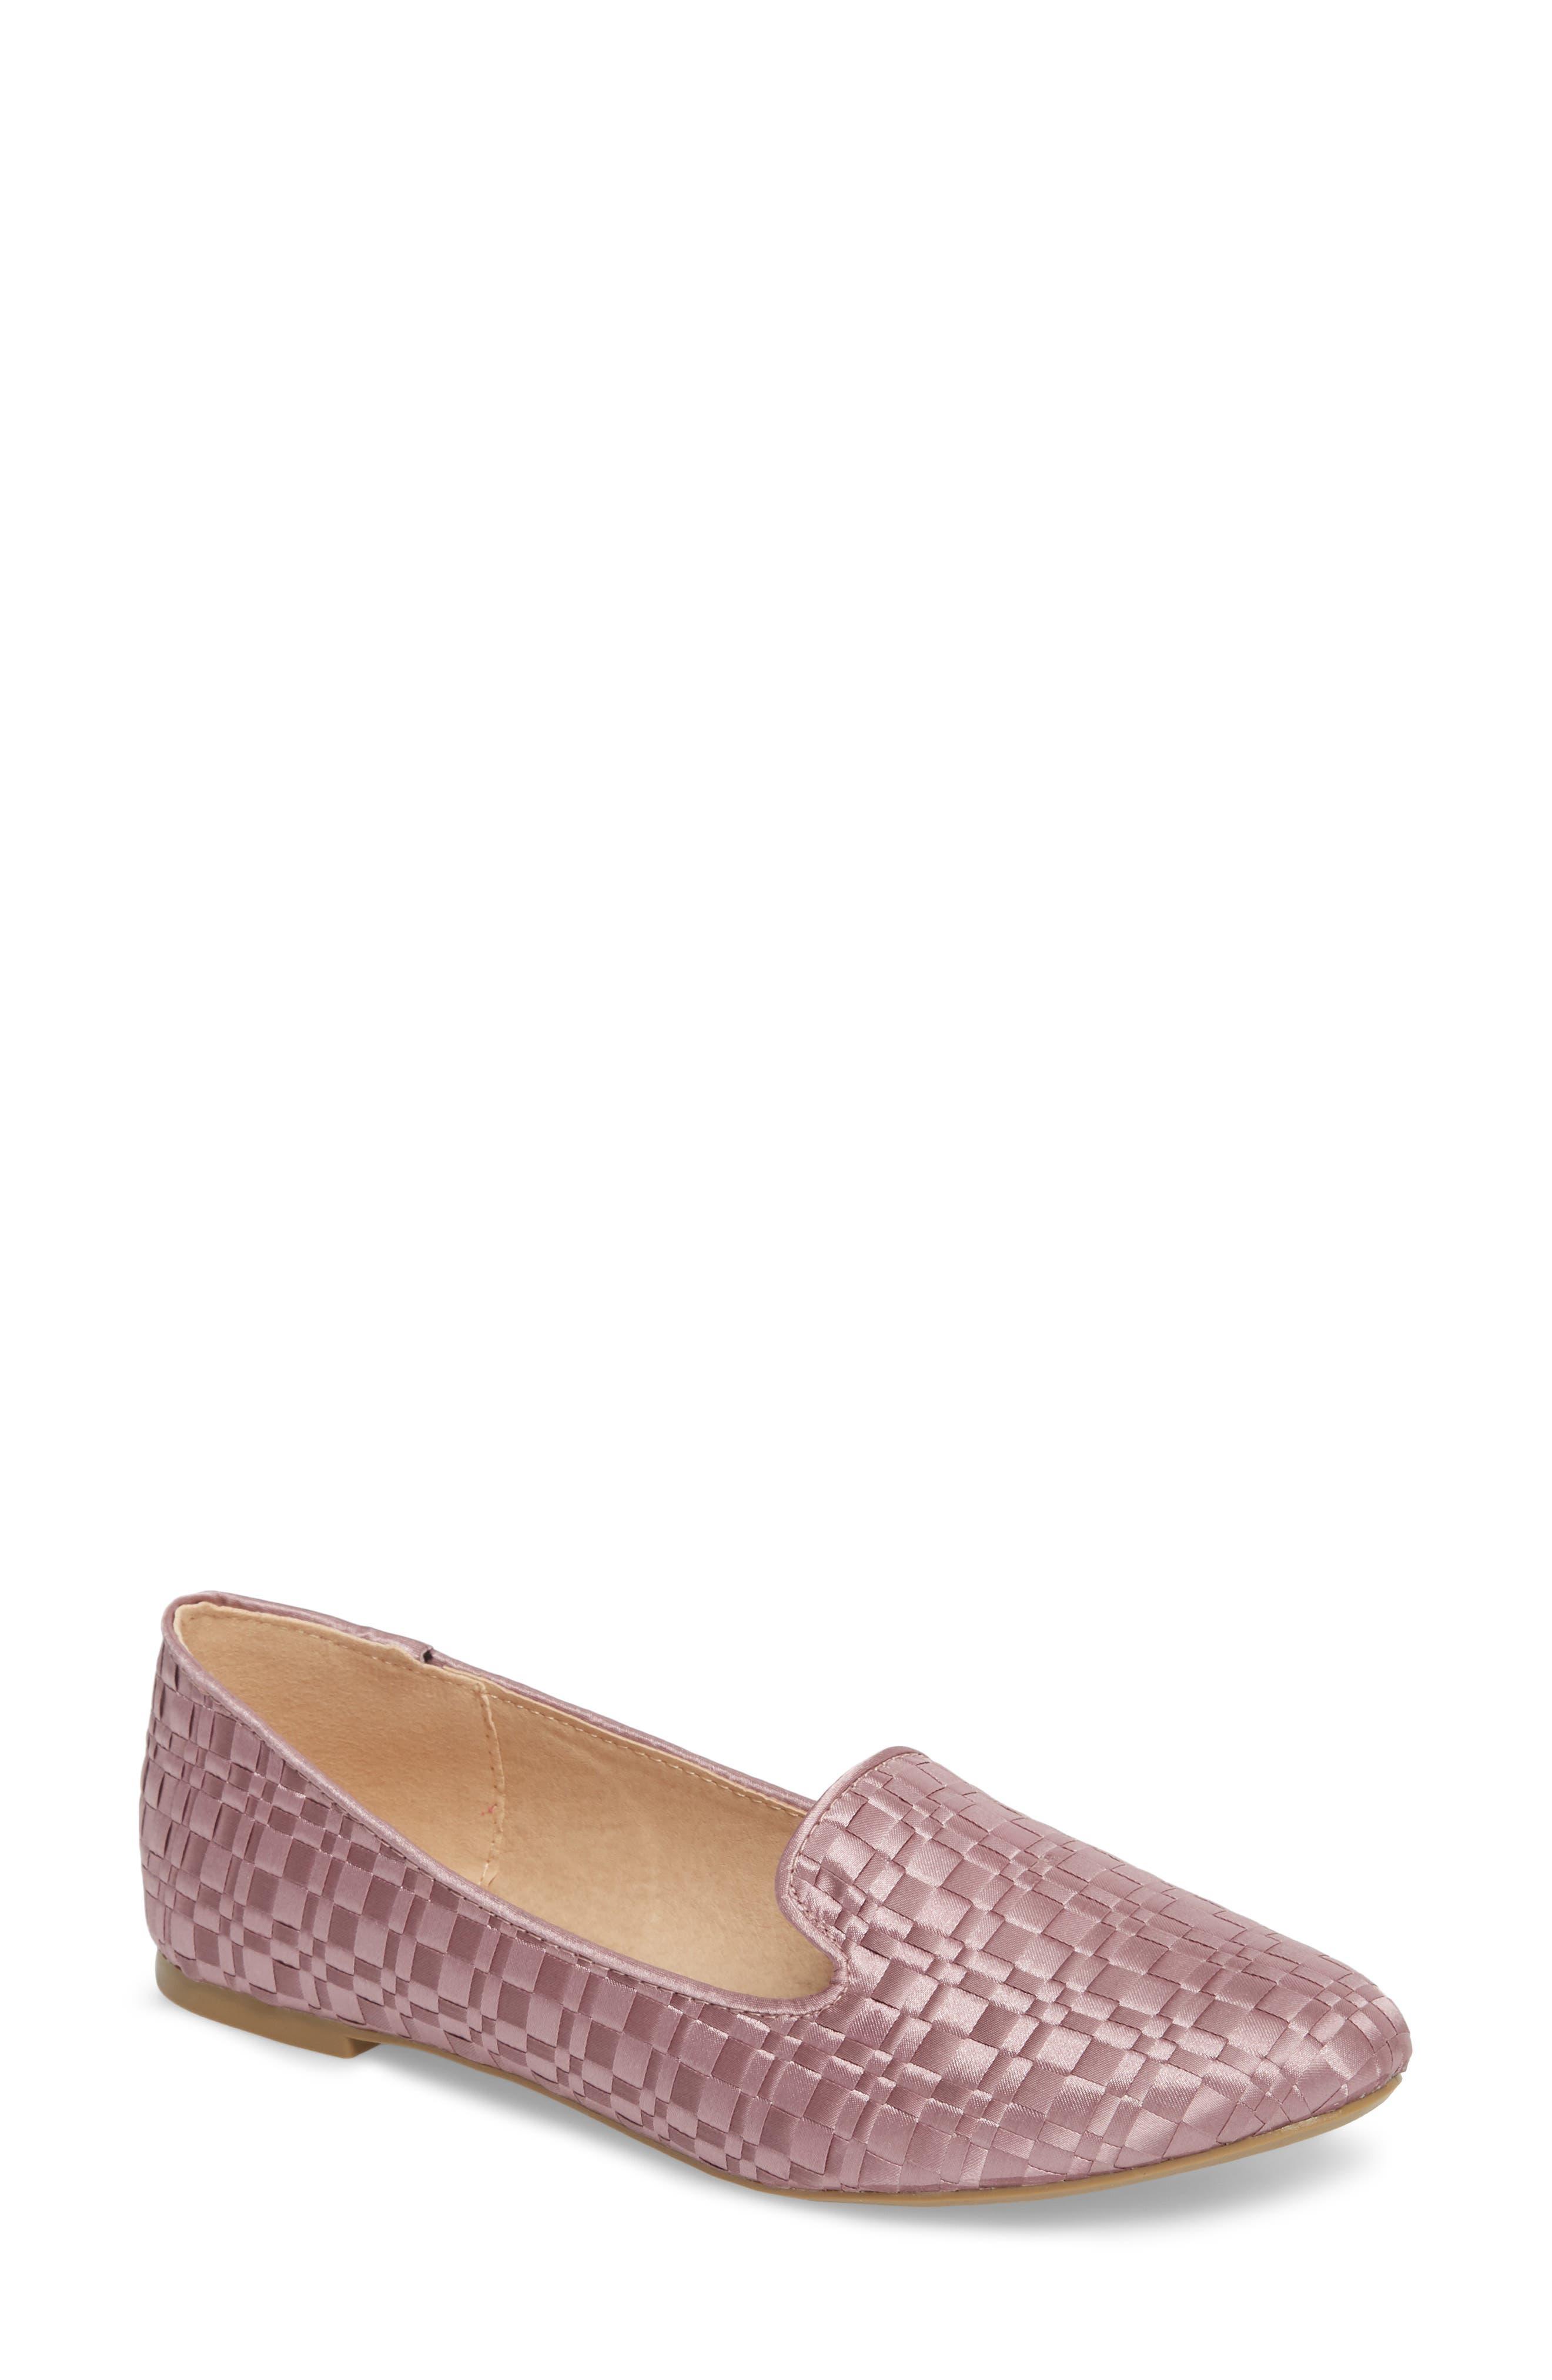 Sasha Textured Woven Loafer,                             Main thumbnail 1, color,                             Pink